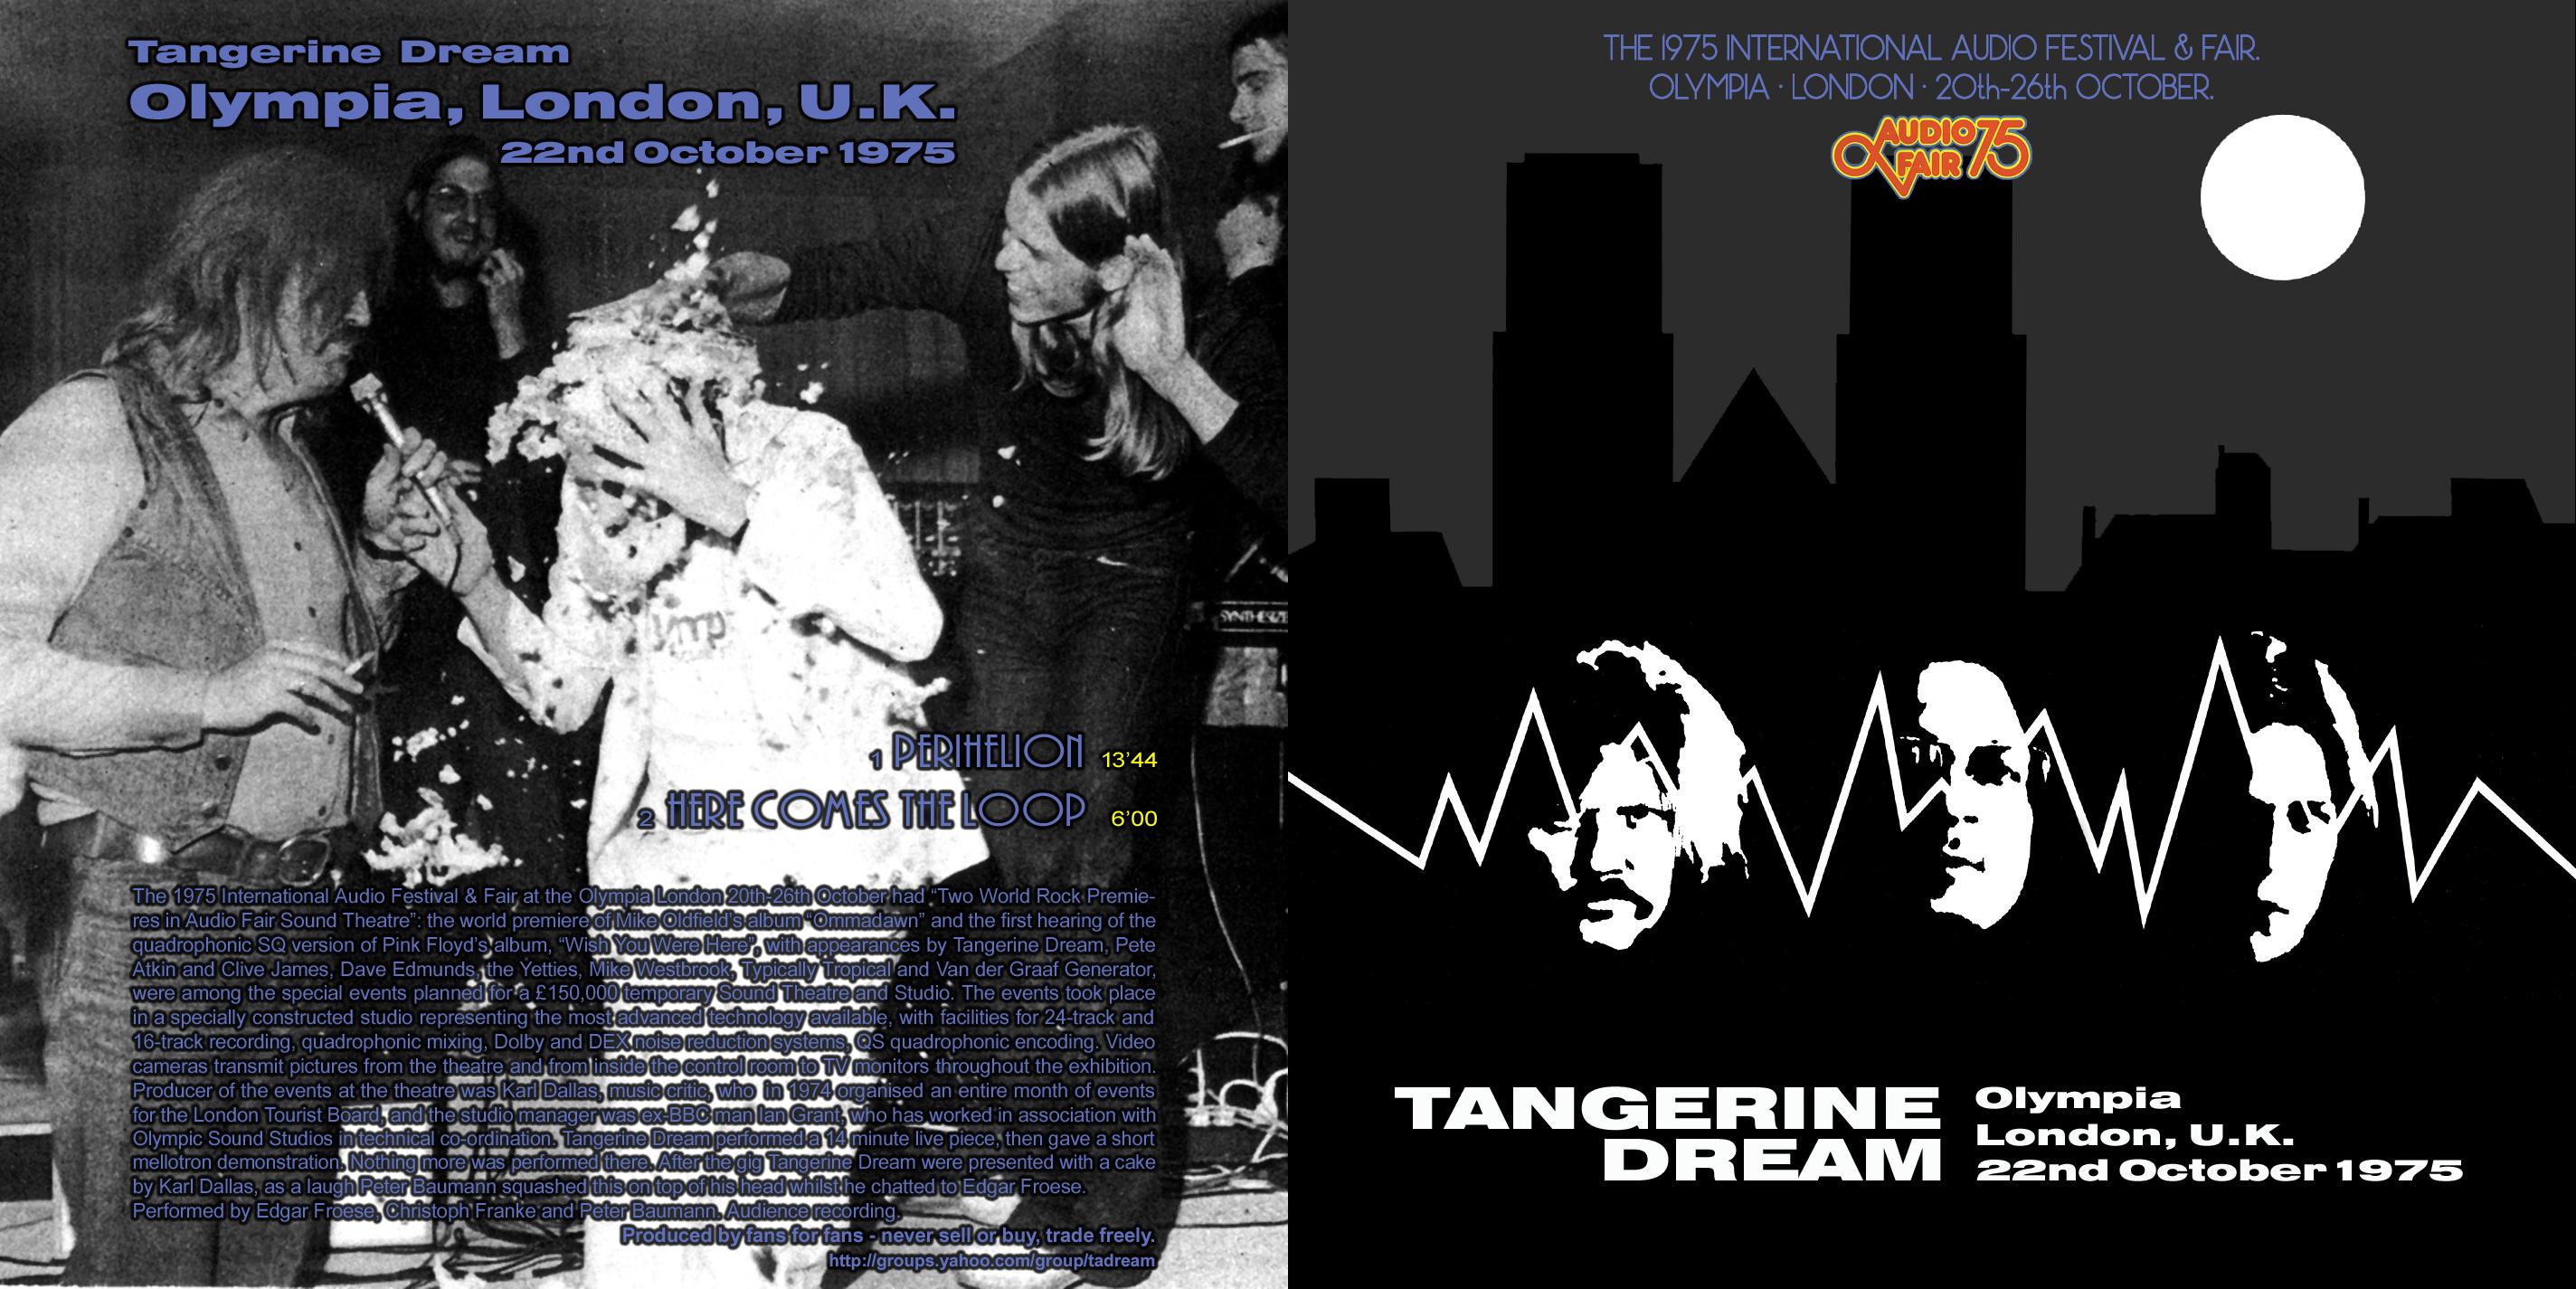 TangerineDream1975-10-22InternationalAudioFestivalFairOlympiaLondonUK.jpg